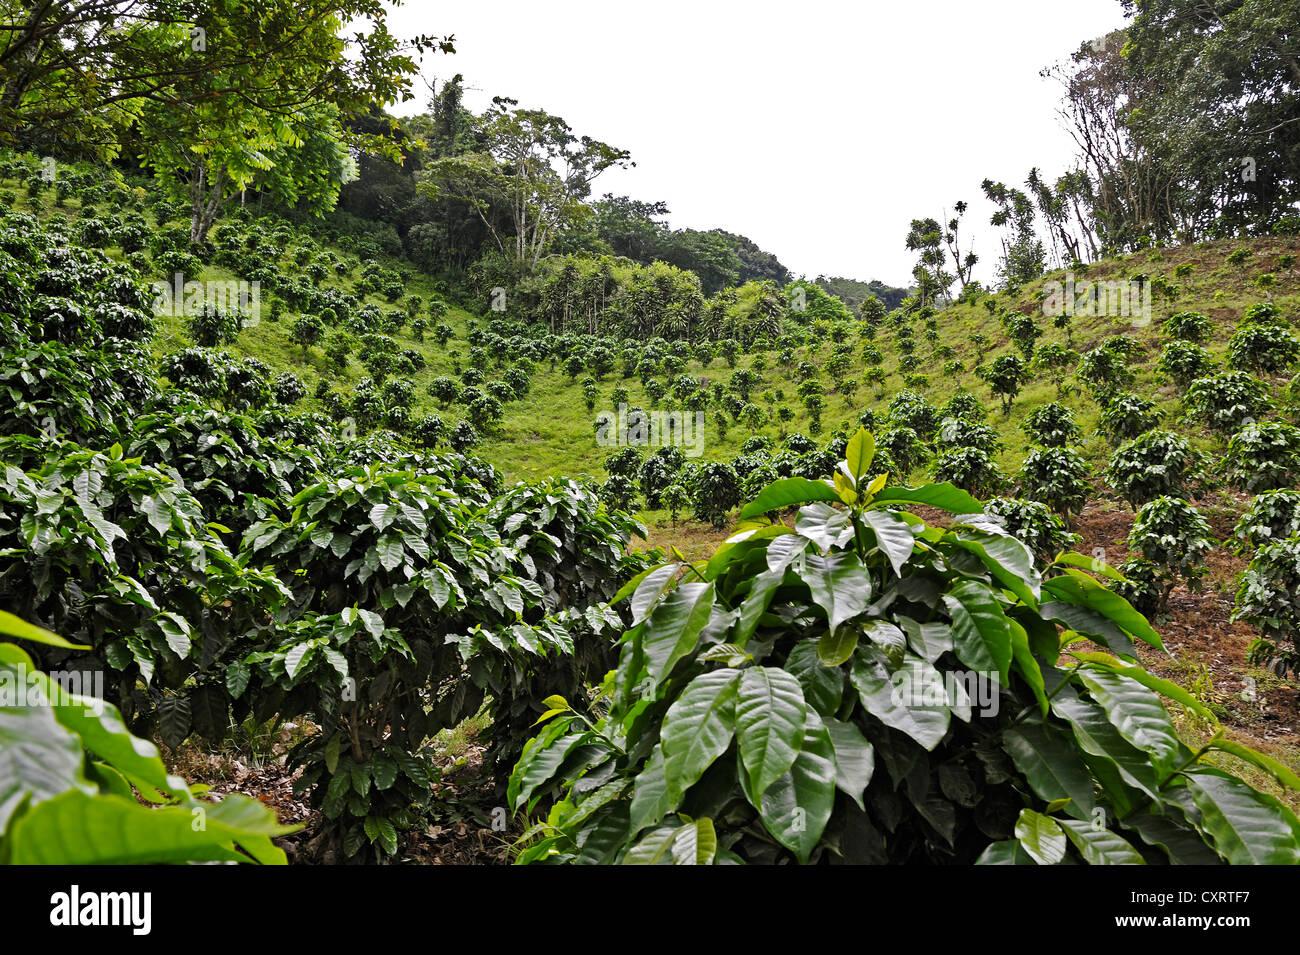 kaffee anbau kaffee pflanzen monteverde alajuela provinz costa rica mittelamerika stockfoto. Black Bedroom Furniture Sets. Home Design Ideas